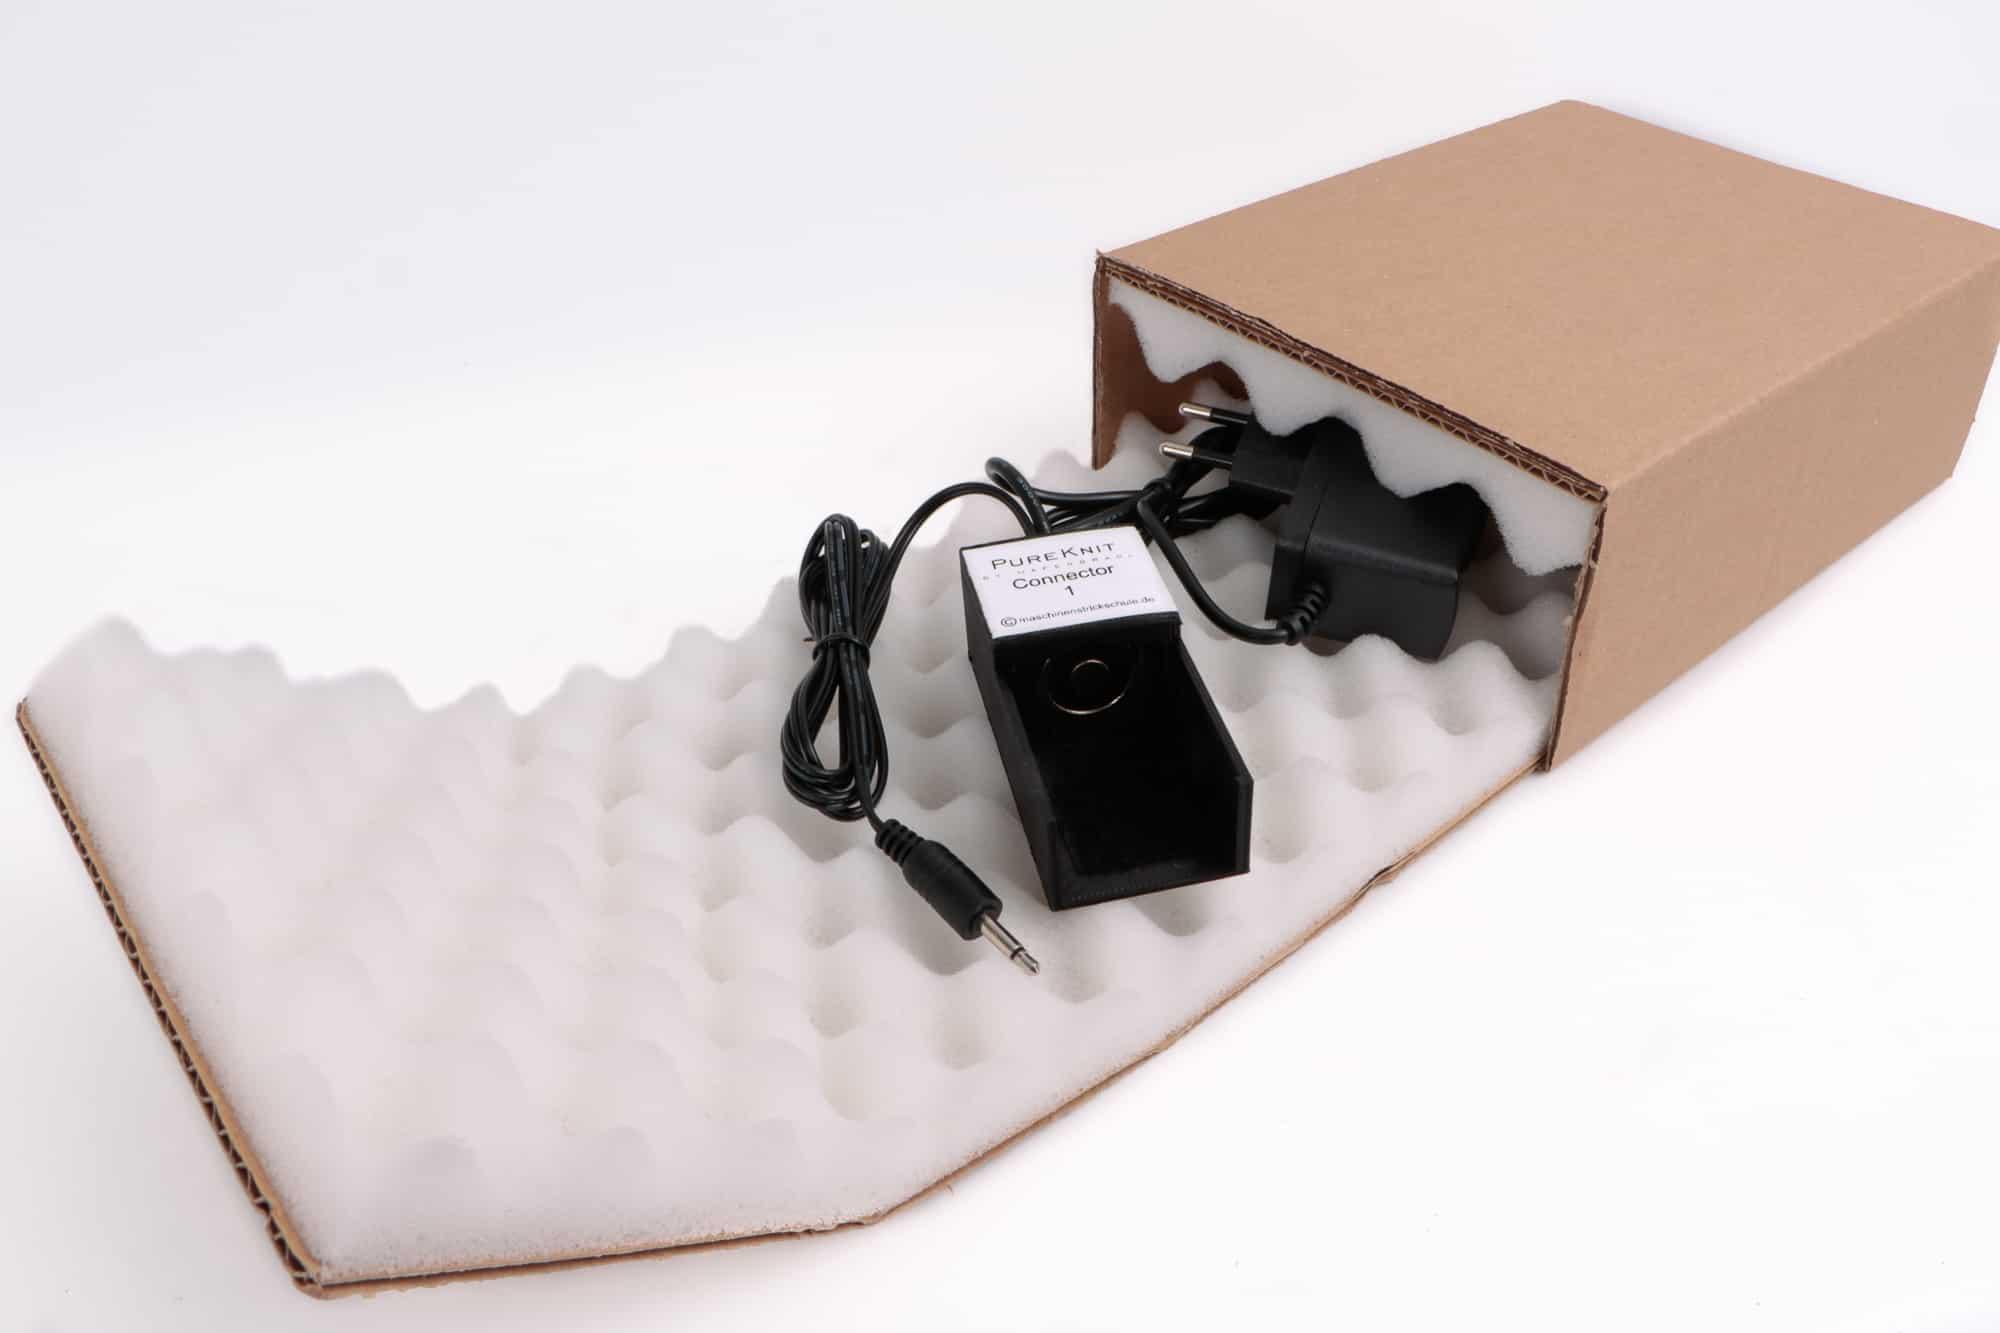 PureKnit Connector 1 im Karton